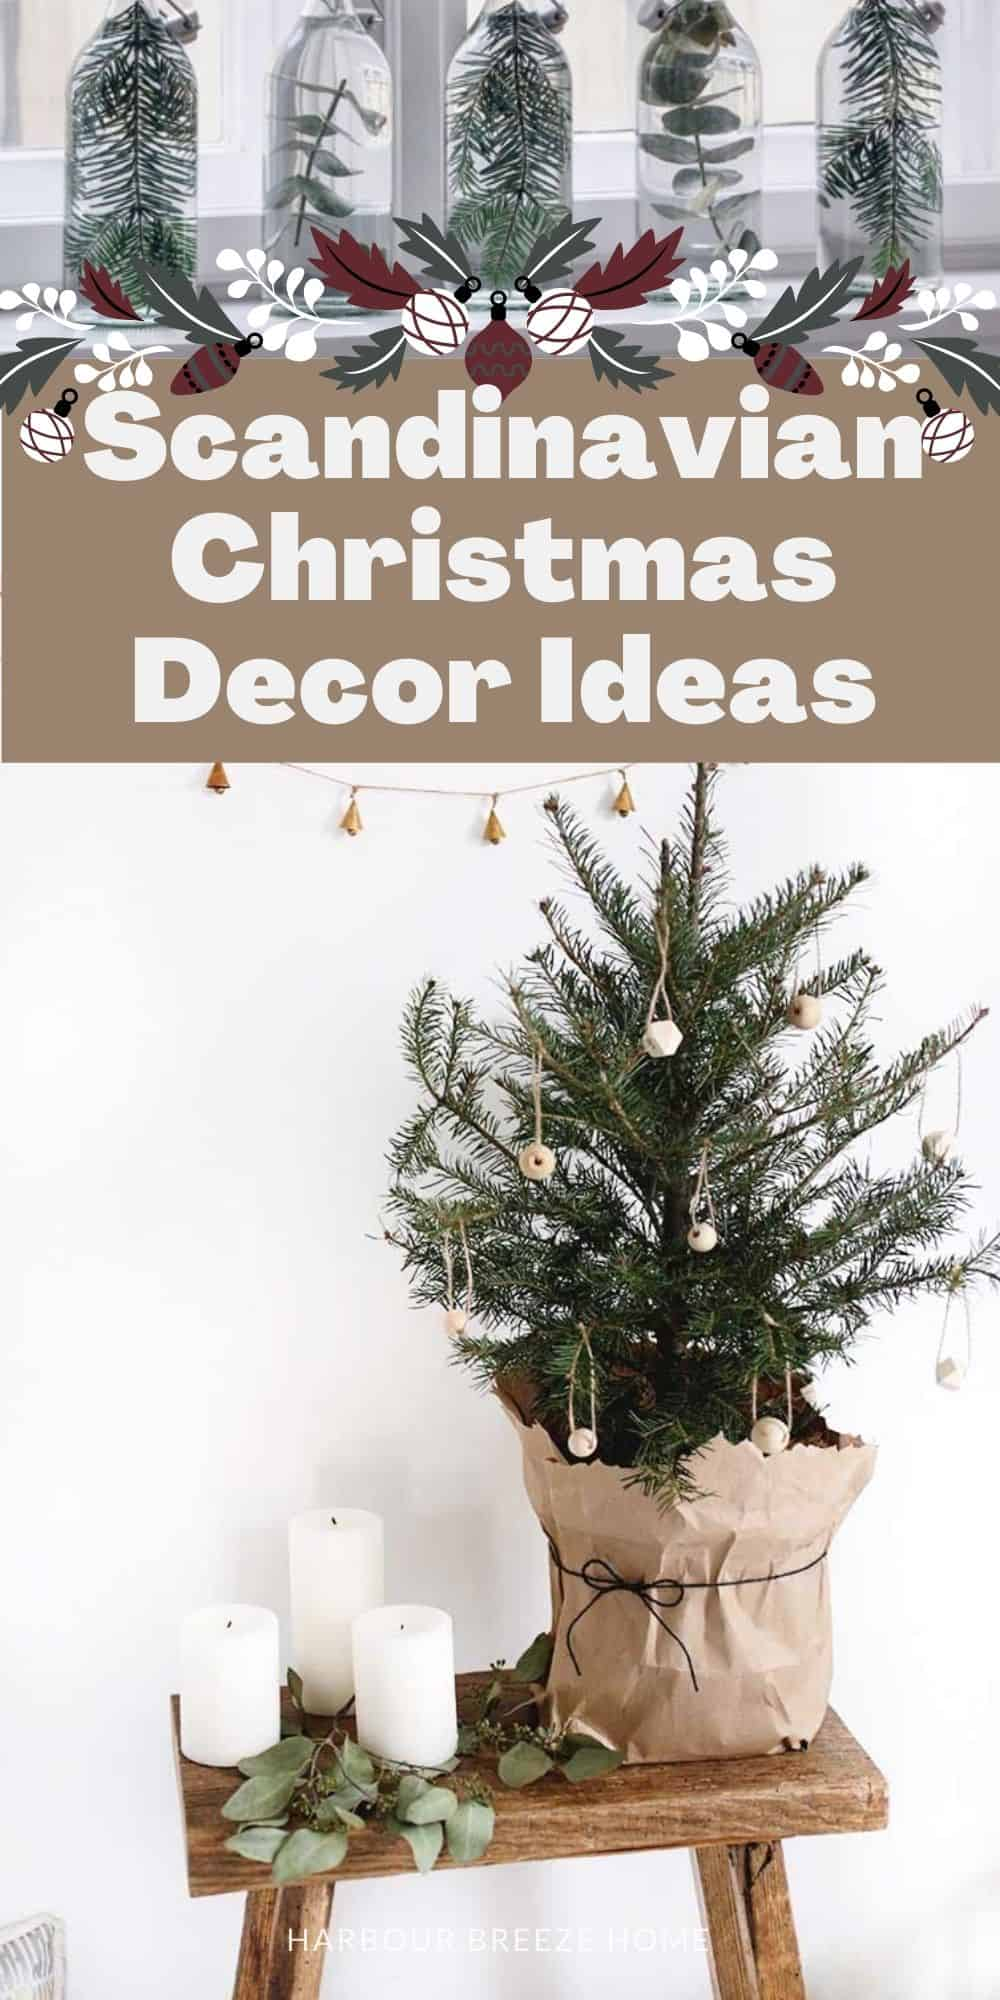 Hygge Scandinavian Christmas Decor Ideas that you can DIY